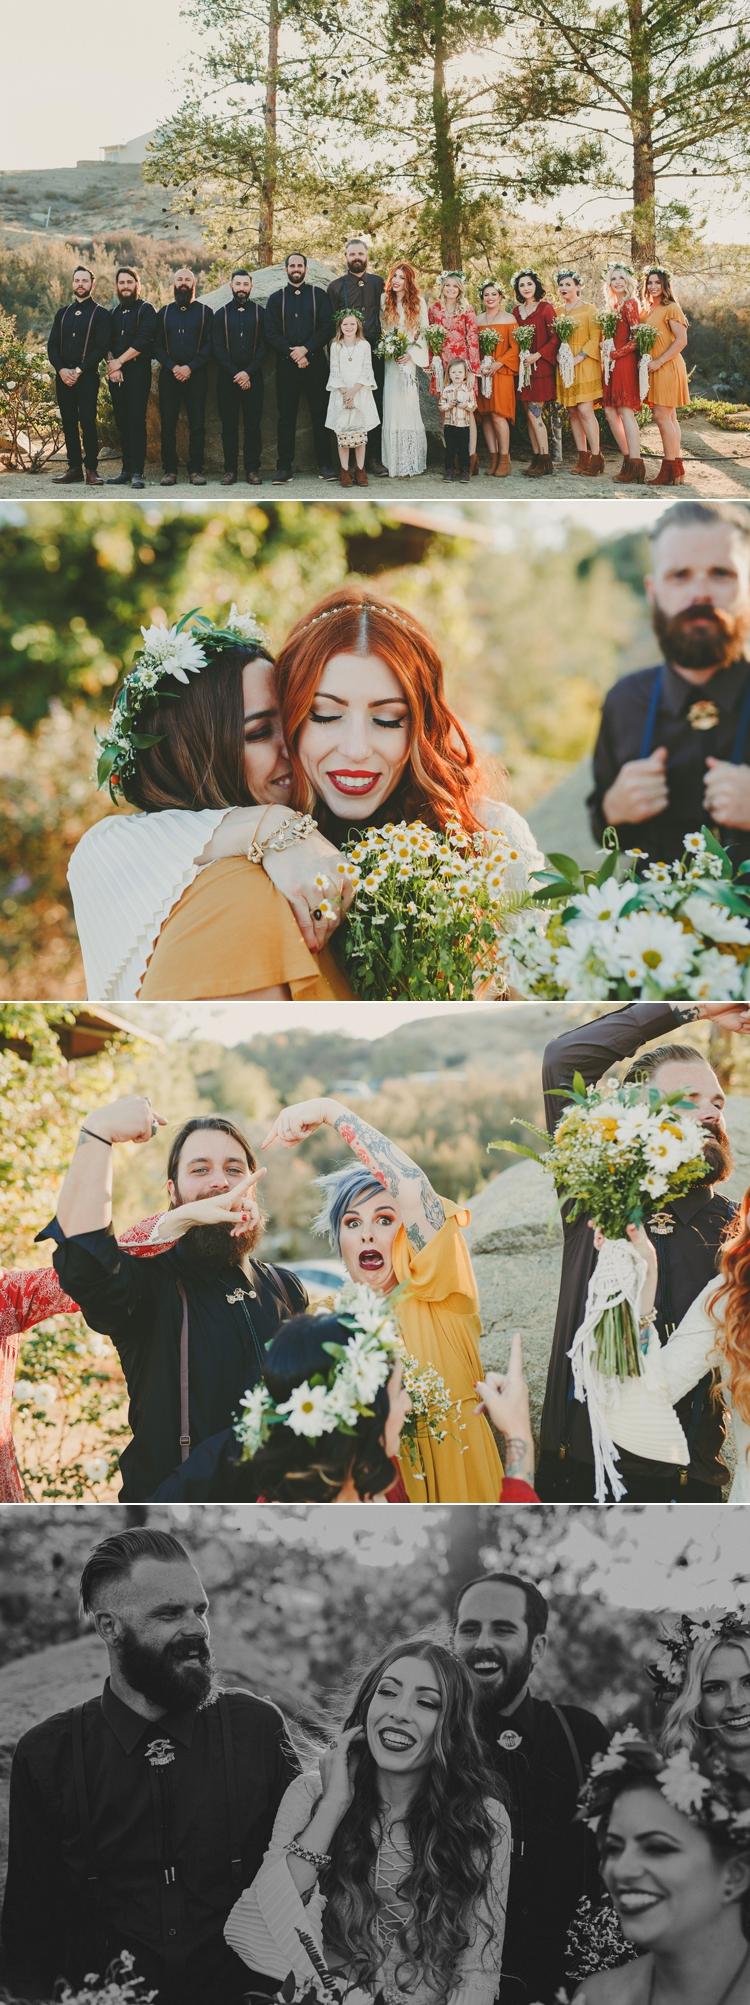 woodstock-inspired-wedding-photos-20